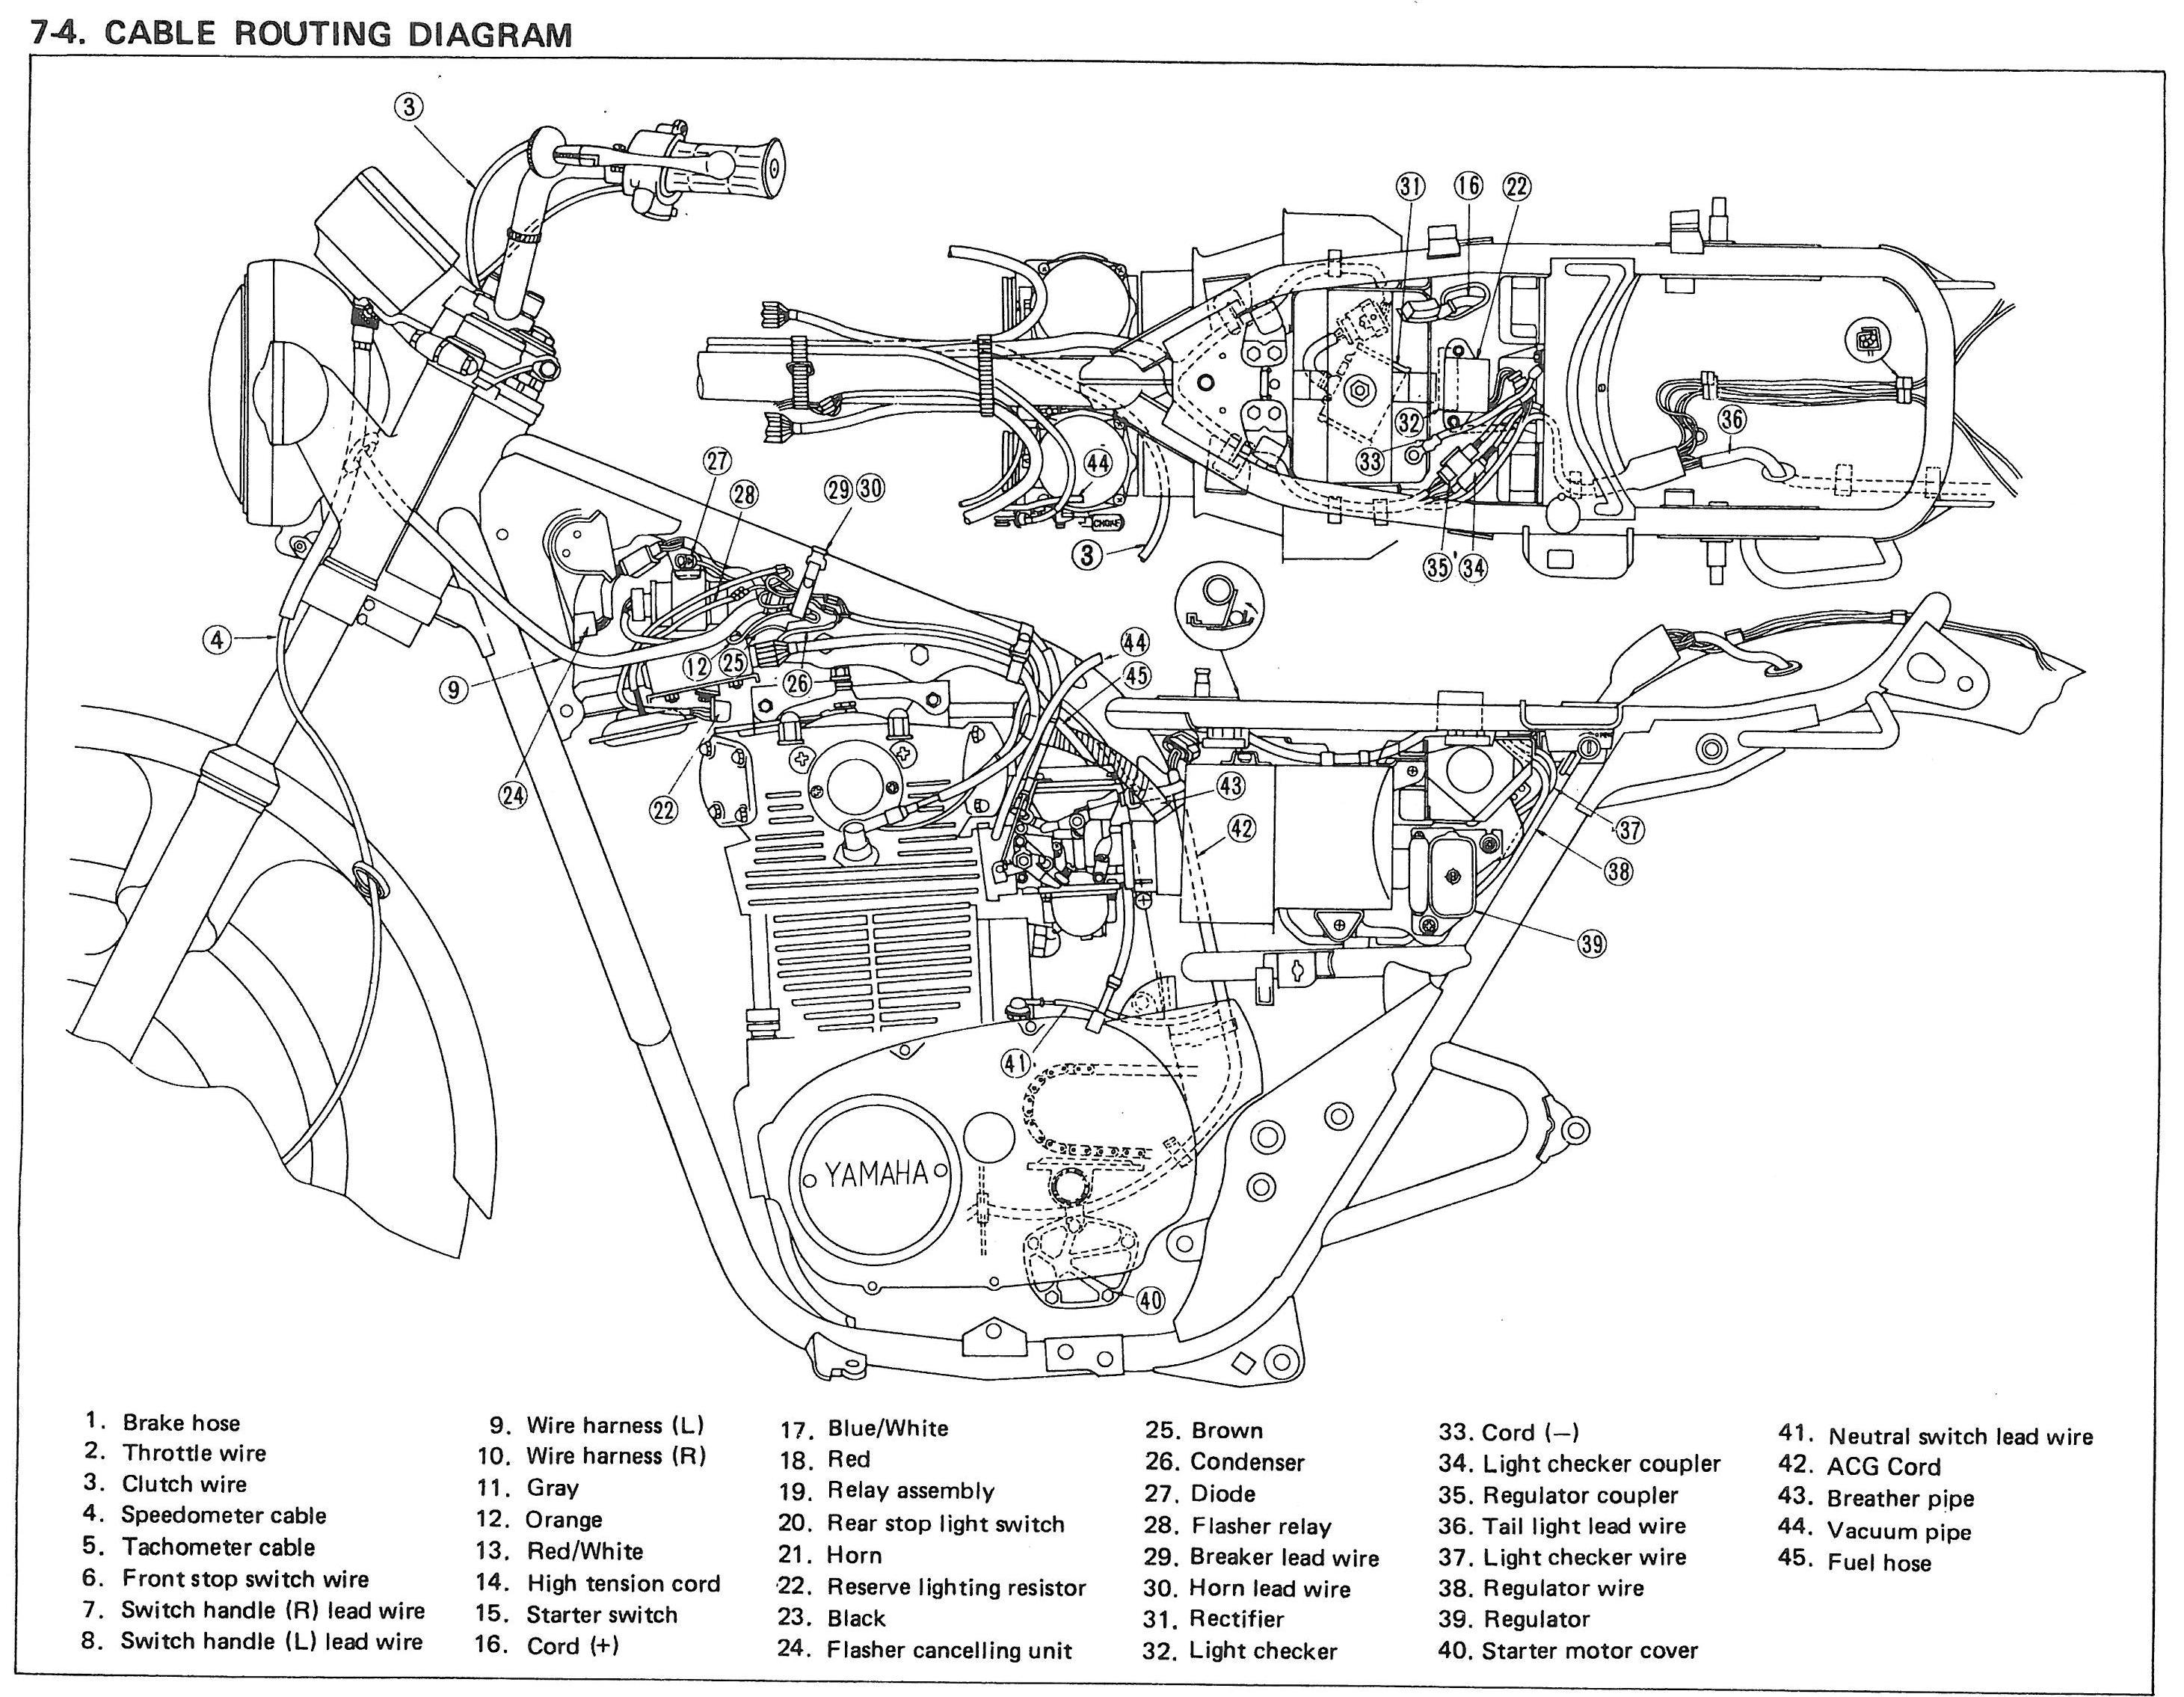 medium resolution of xs650 oil diagram schematics wiring diagrams u2022 rh seniorlivinguniversity co xs650 carburetor diagram yamaha xs650 engine